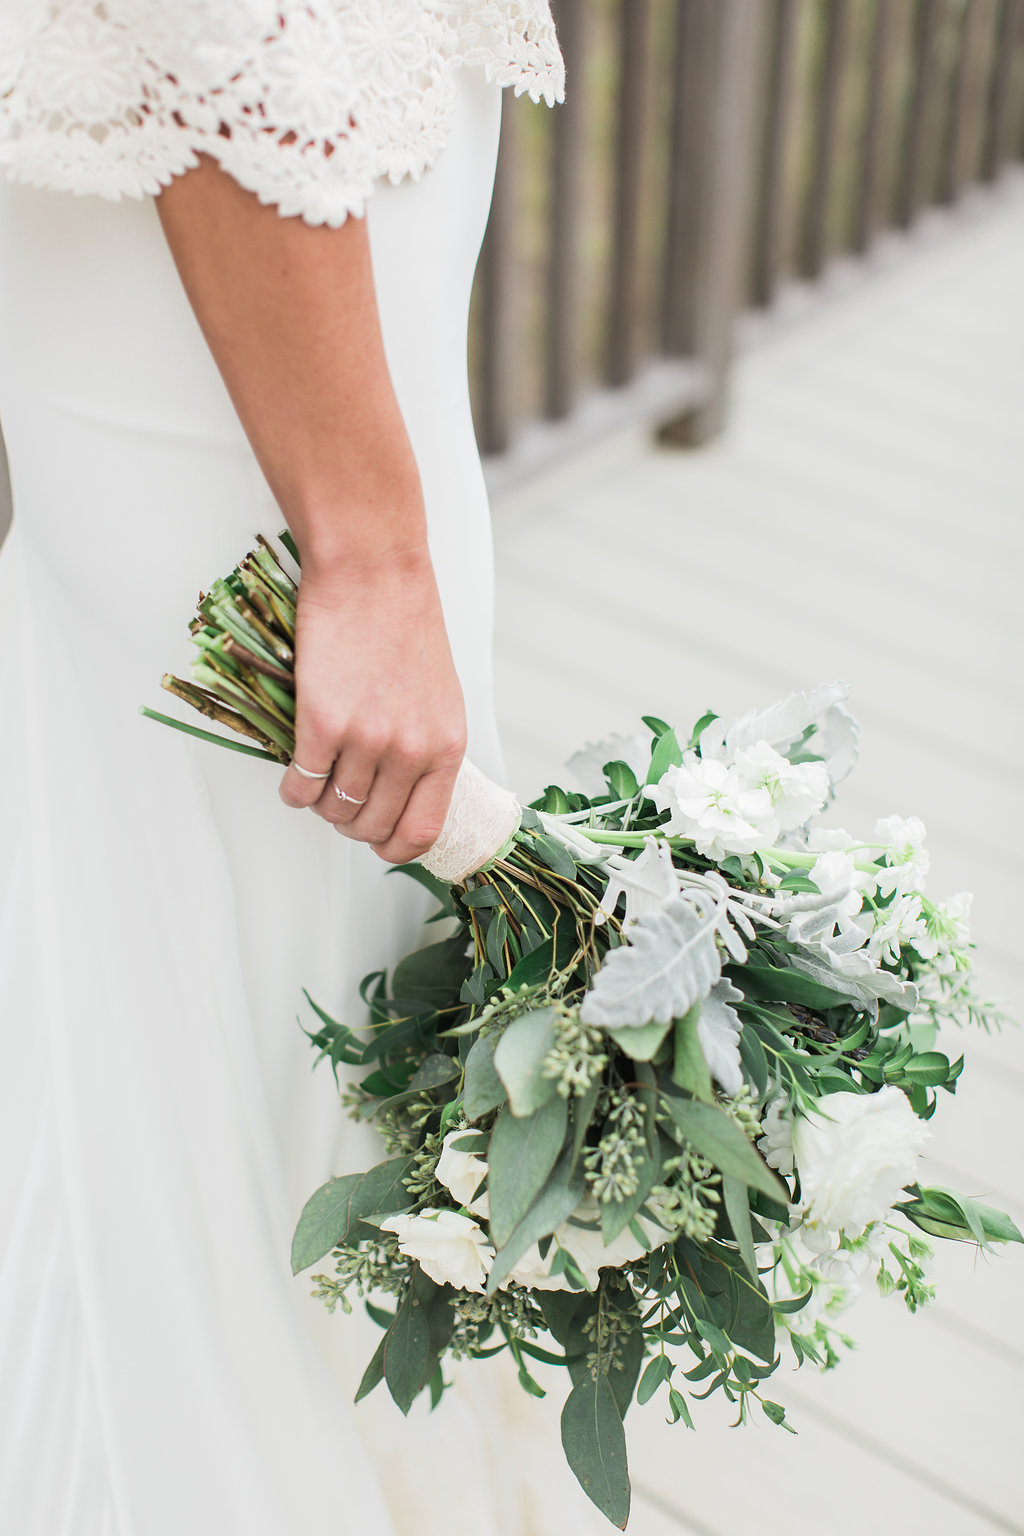 stacey-and-tj-wedding-apartment-b-photography-ivory-and-beau-bridal-boutique-savannah-wedding-dresses-daughters-of-simone-lu-boho-bride-boho-wedding-savannah-boho-wedding-savannah-weddings-savannah-bridal-gowns-savannah-wedding-24.jpg